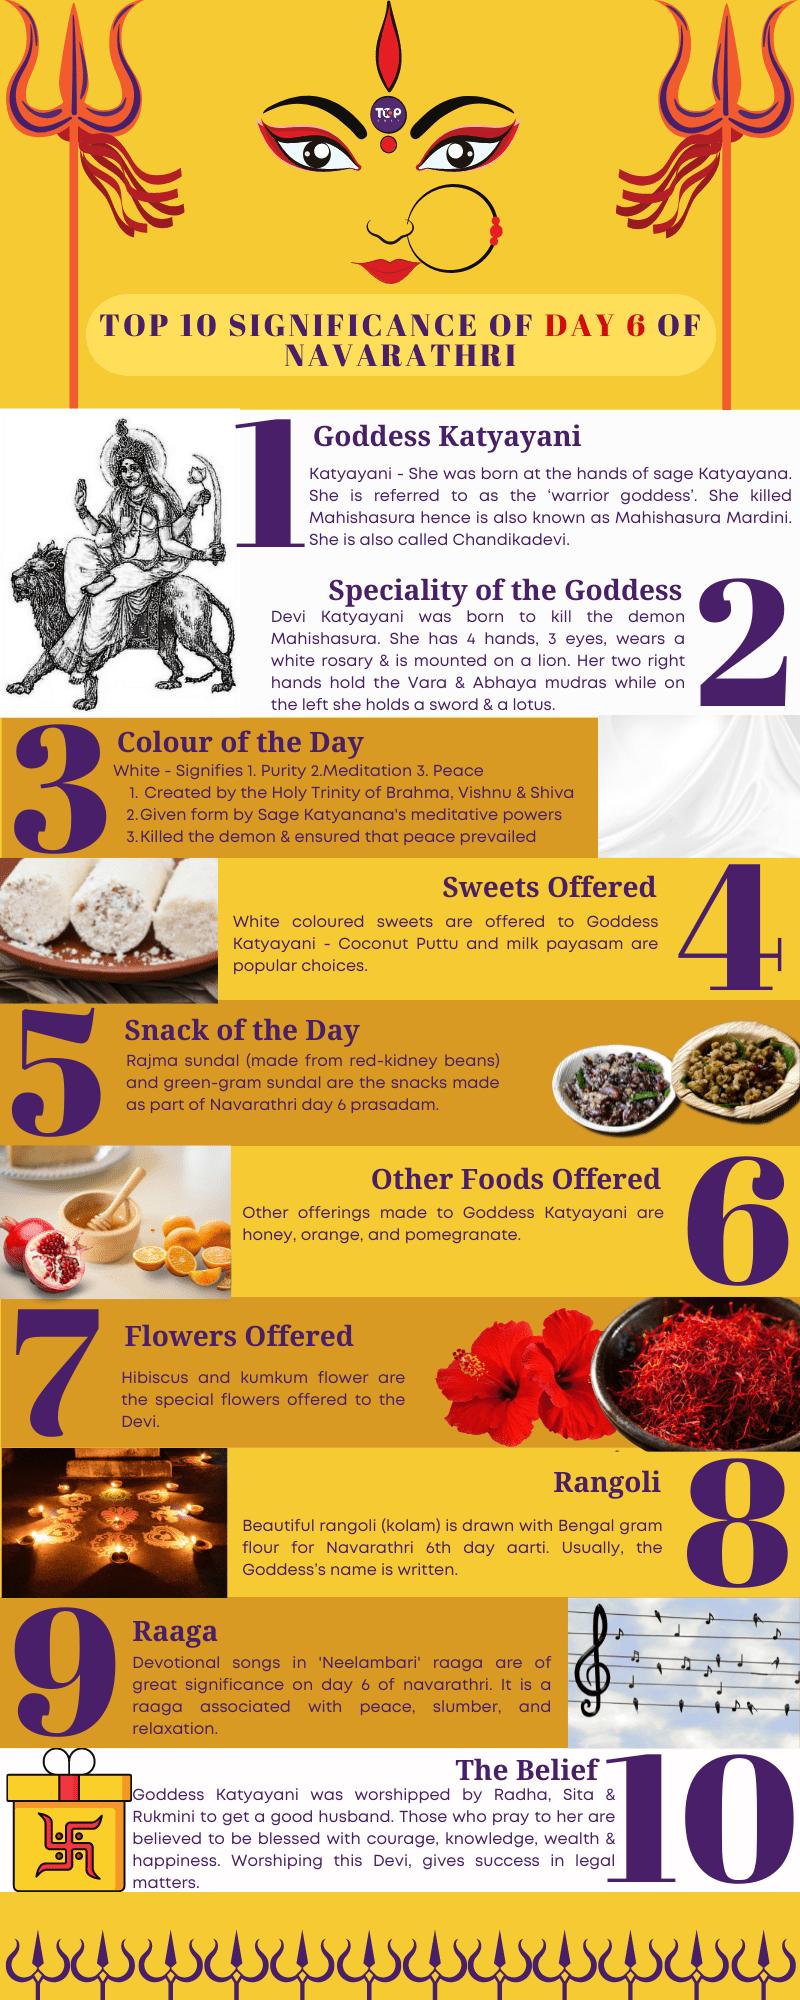 Significance of Day 6 of Navarathri